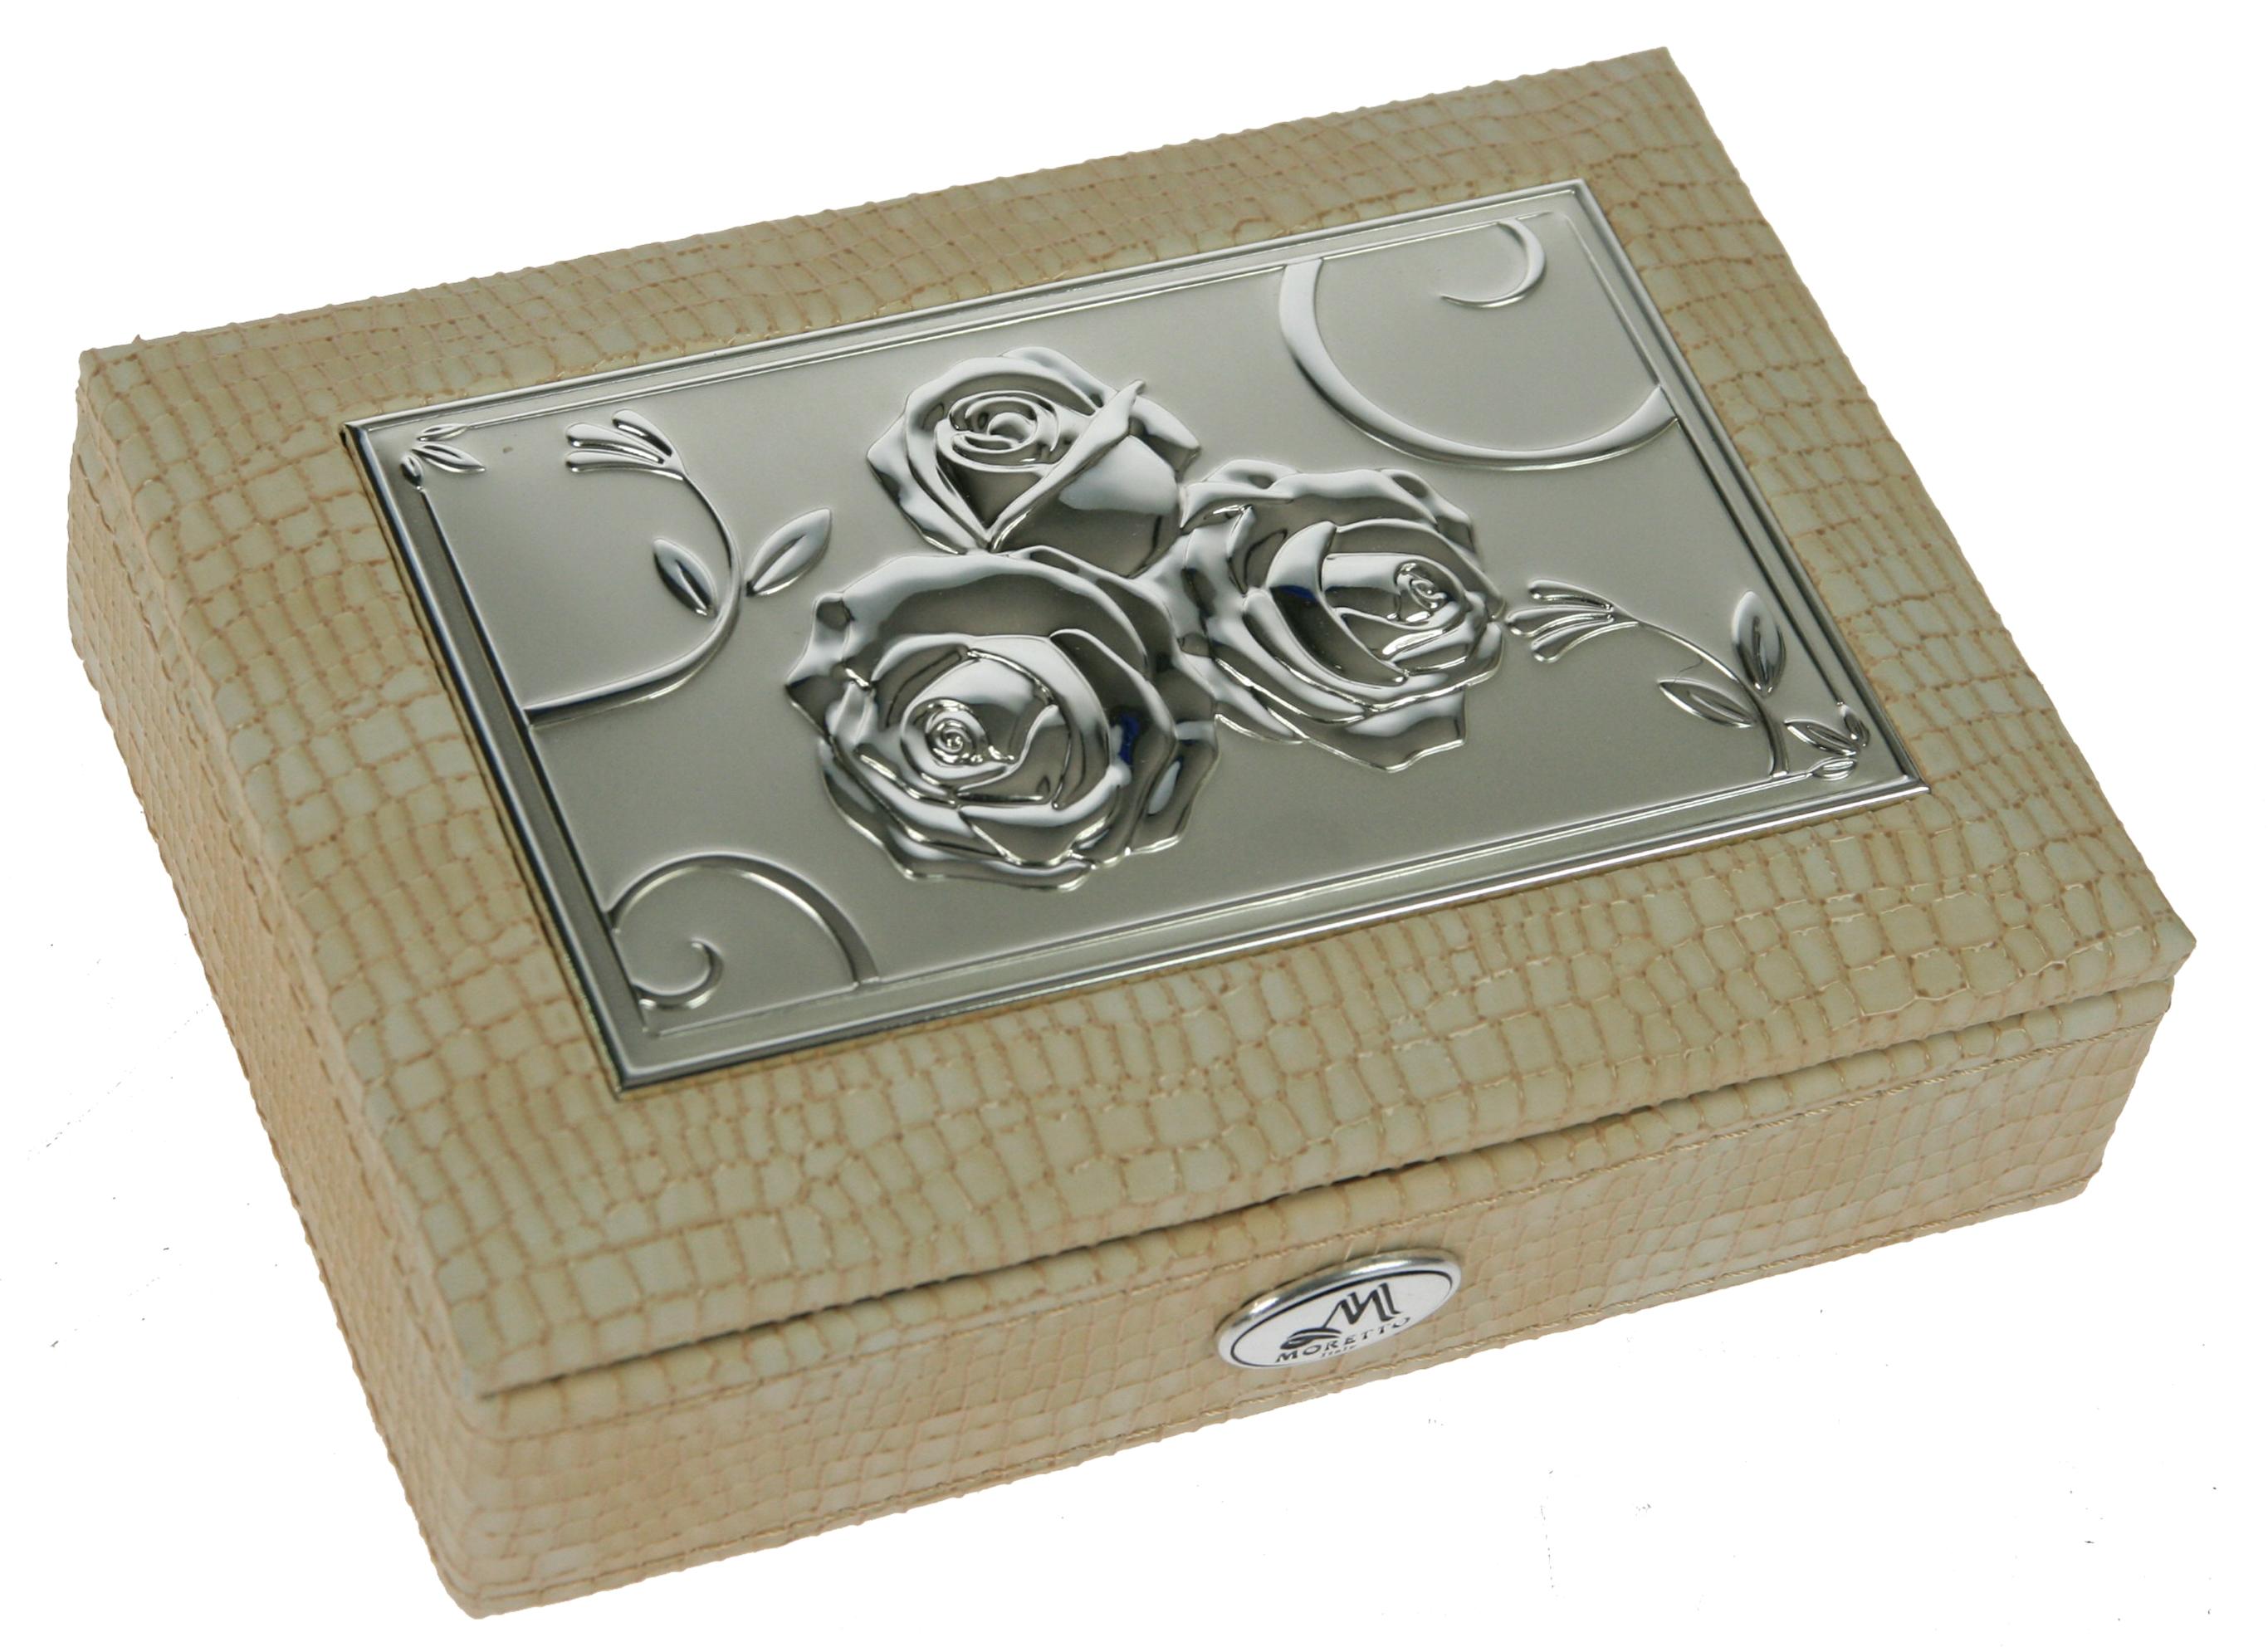 Шкатулка для ювелирных украшений Moretto, 18 х 13 х 5 см. 39944 шкатулка для ювелирных украшений moretto 18 х 13 х 5 см 139522